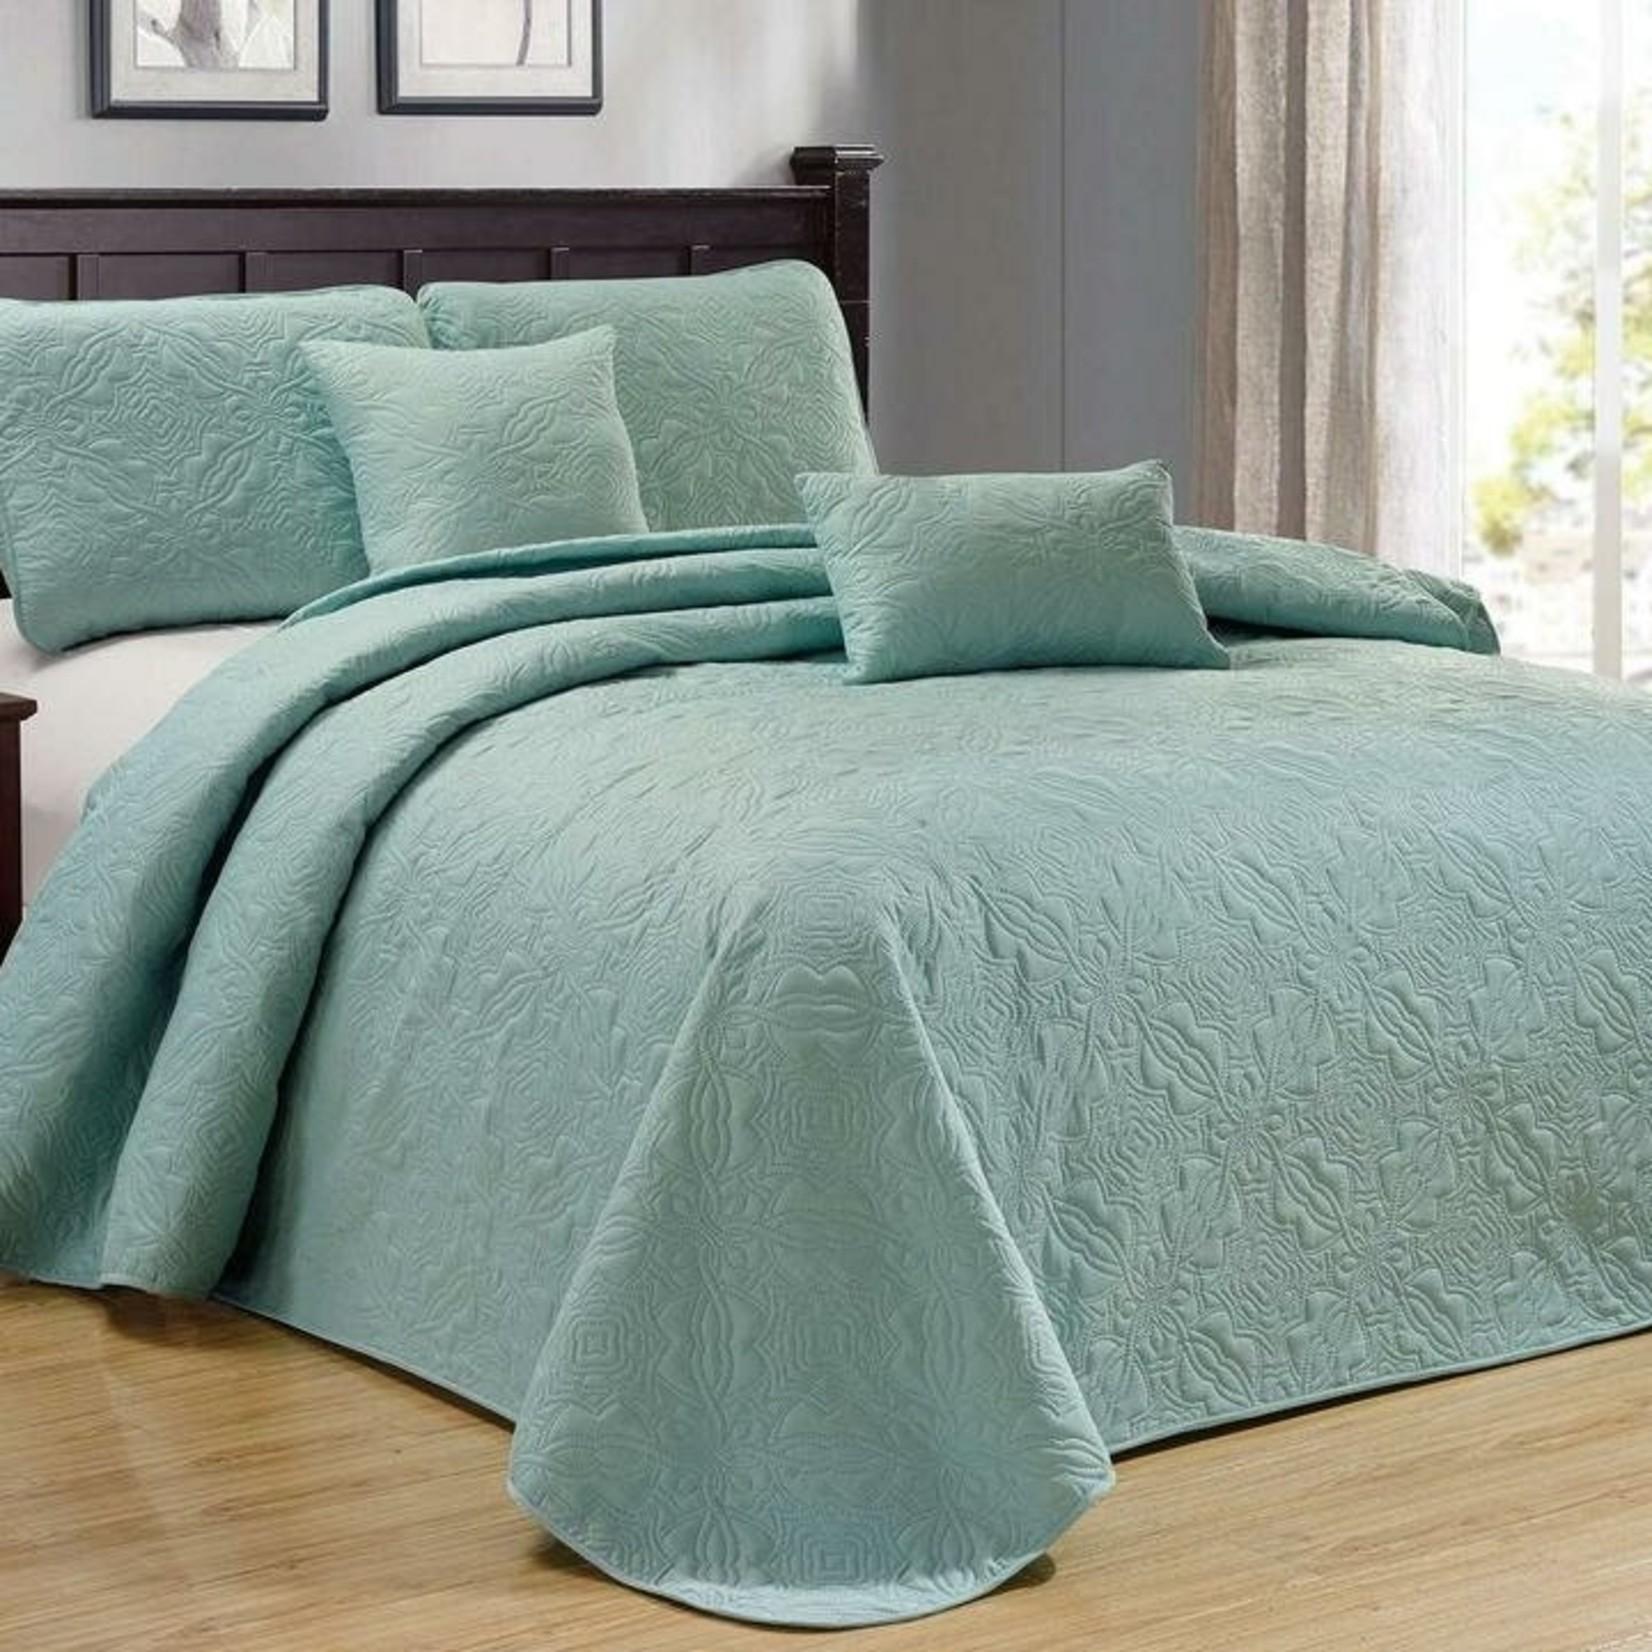 *Full/Queen - Loken 5 Piece Reversible Quilt Set - Spa Green - Final Sale